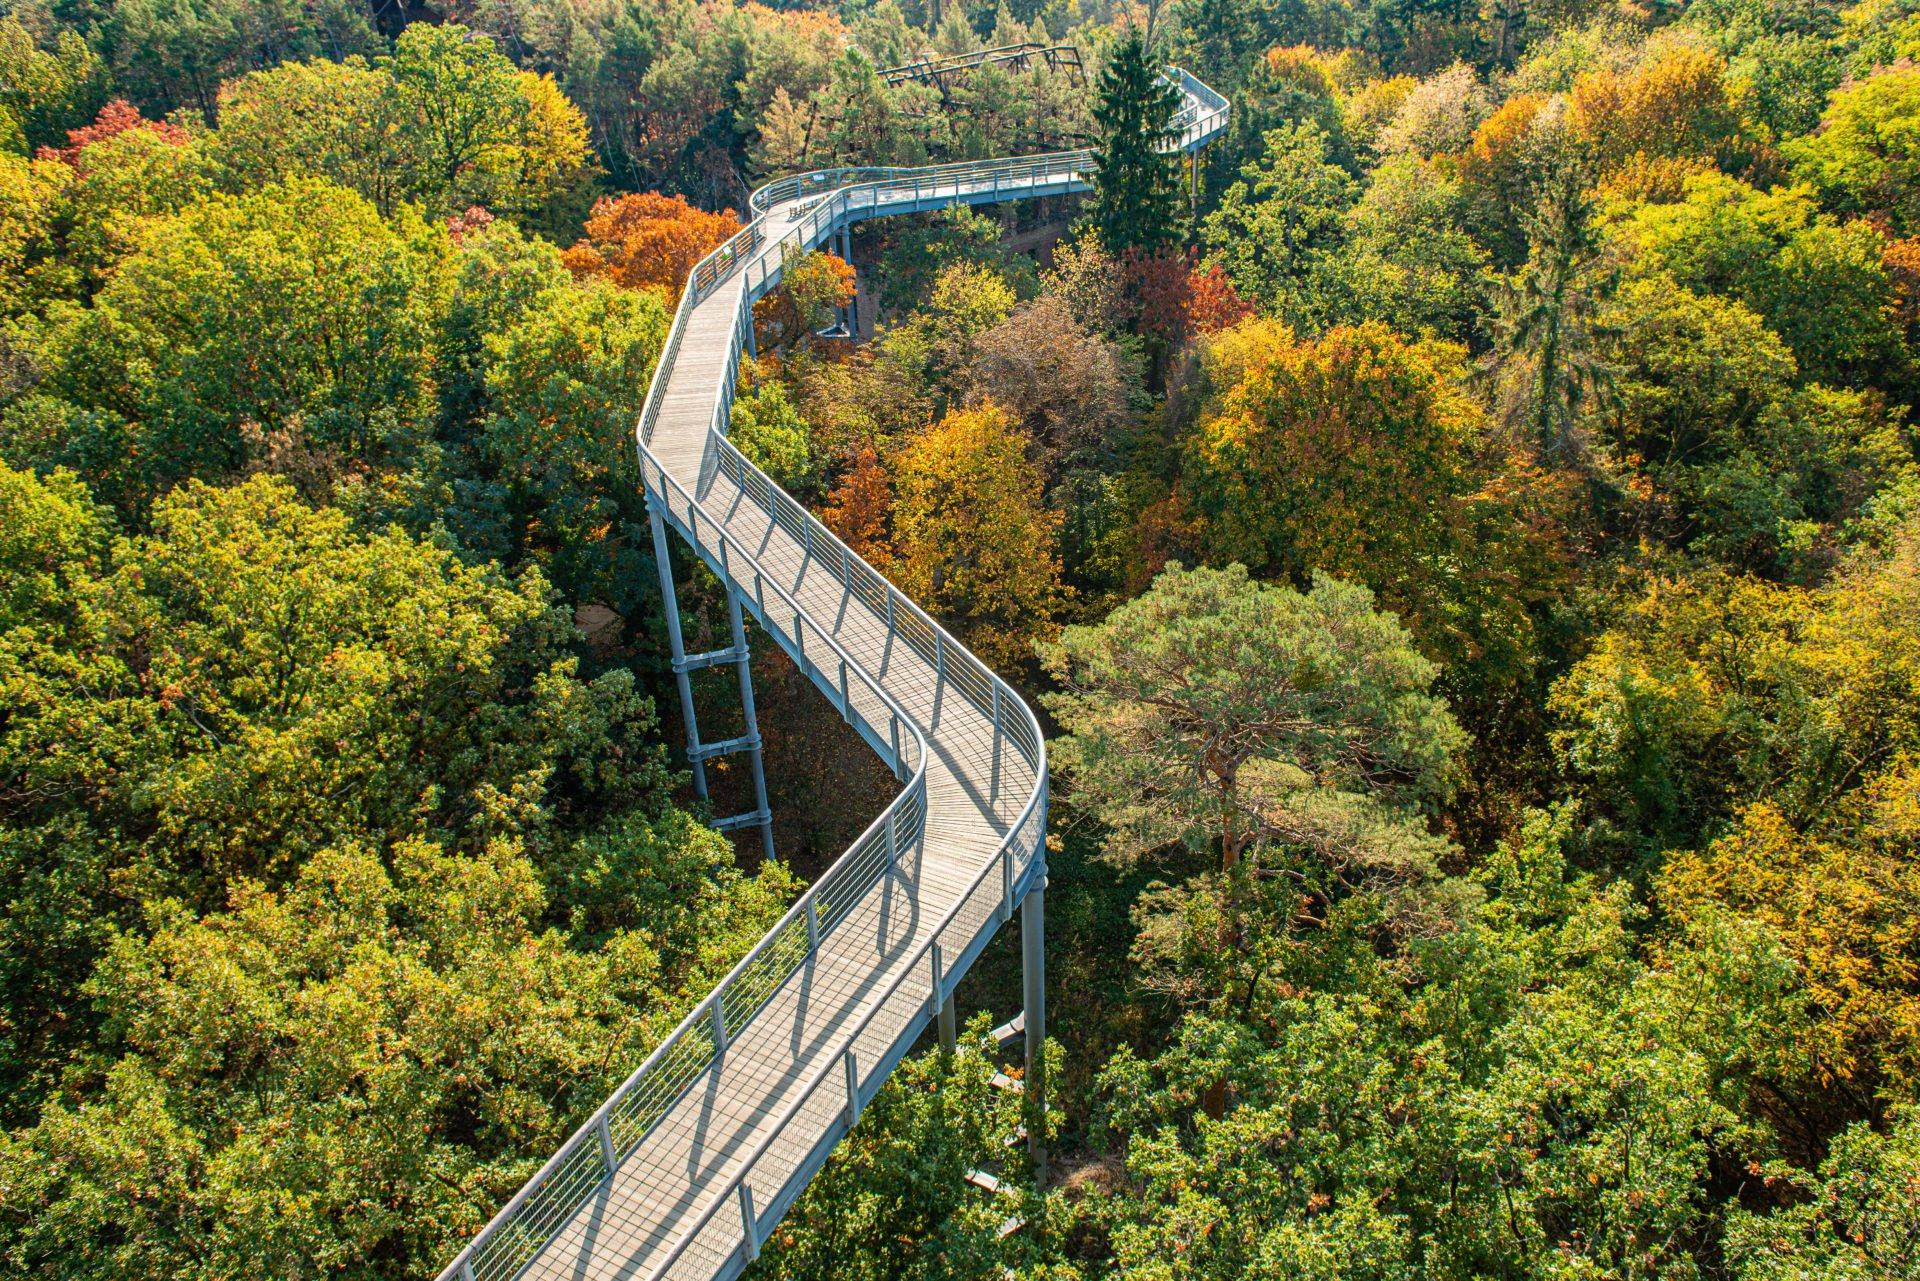 Top 12 Baumwipfelpfade in Deutschland - inkl. Karte & Bilder